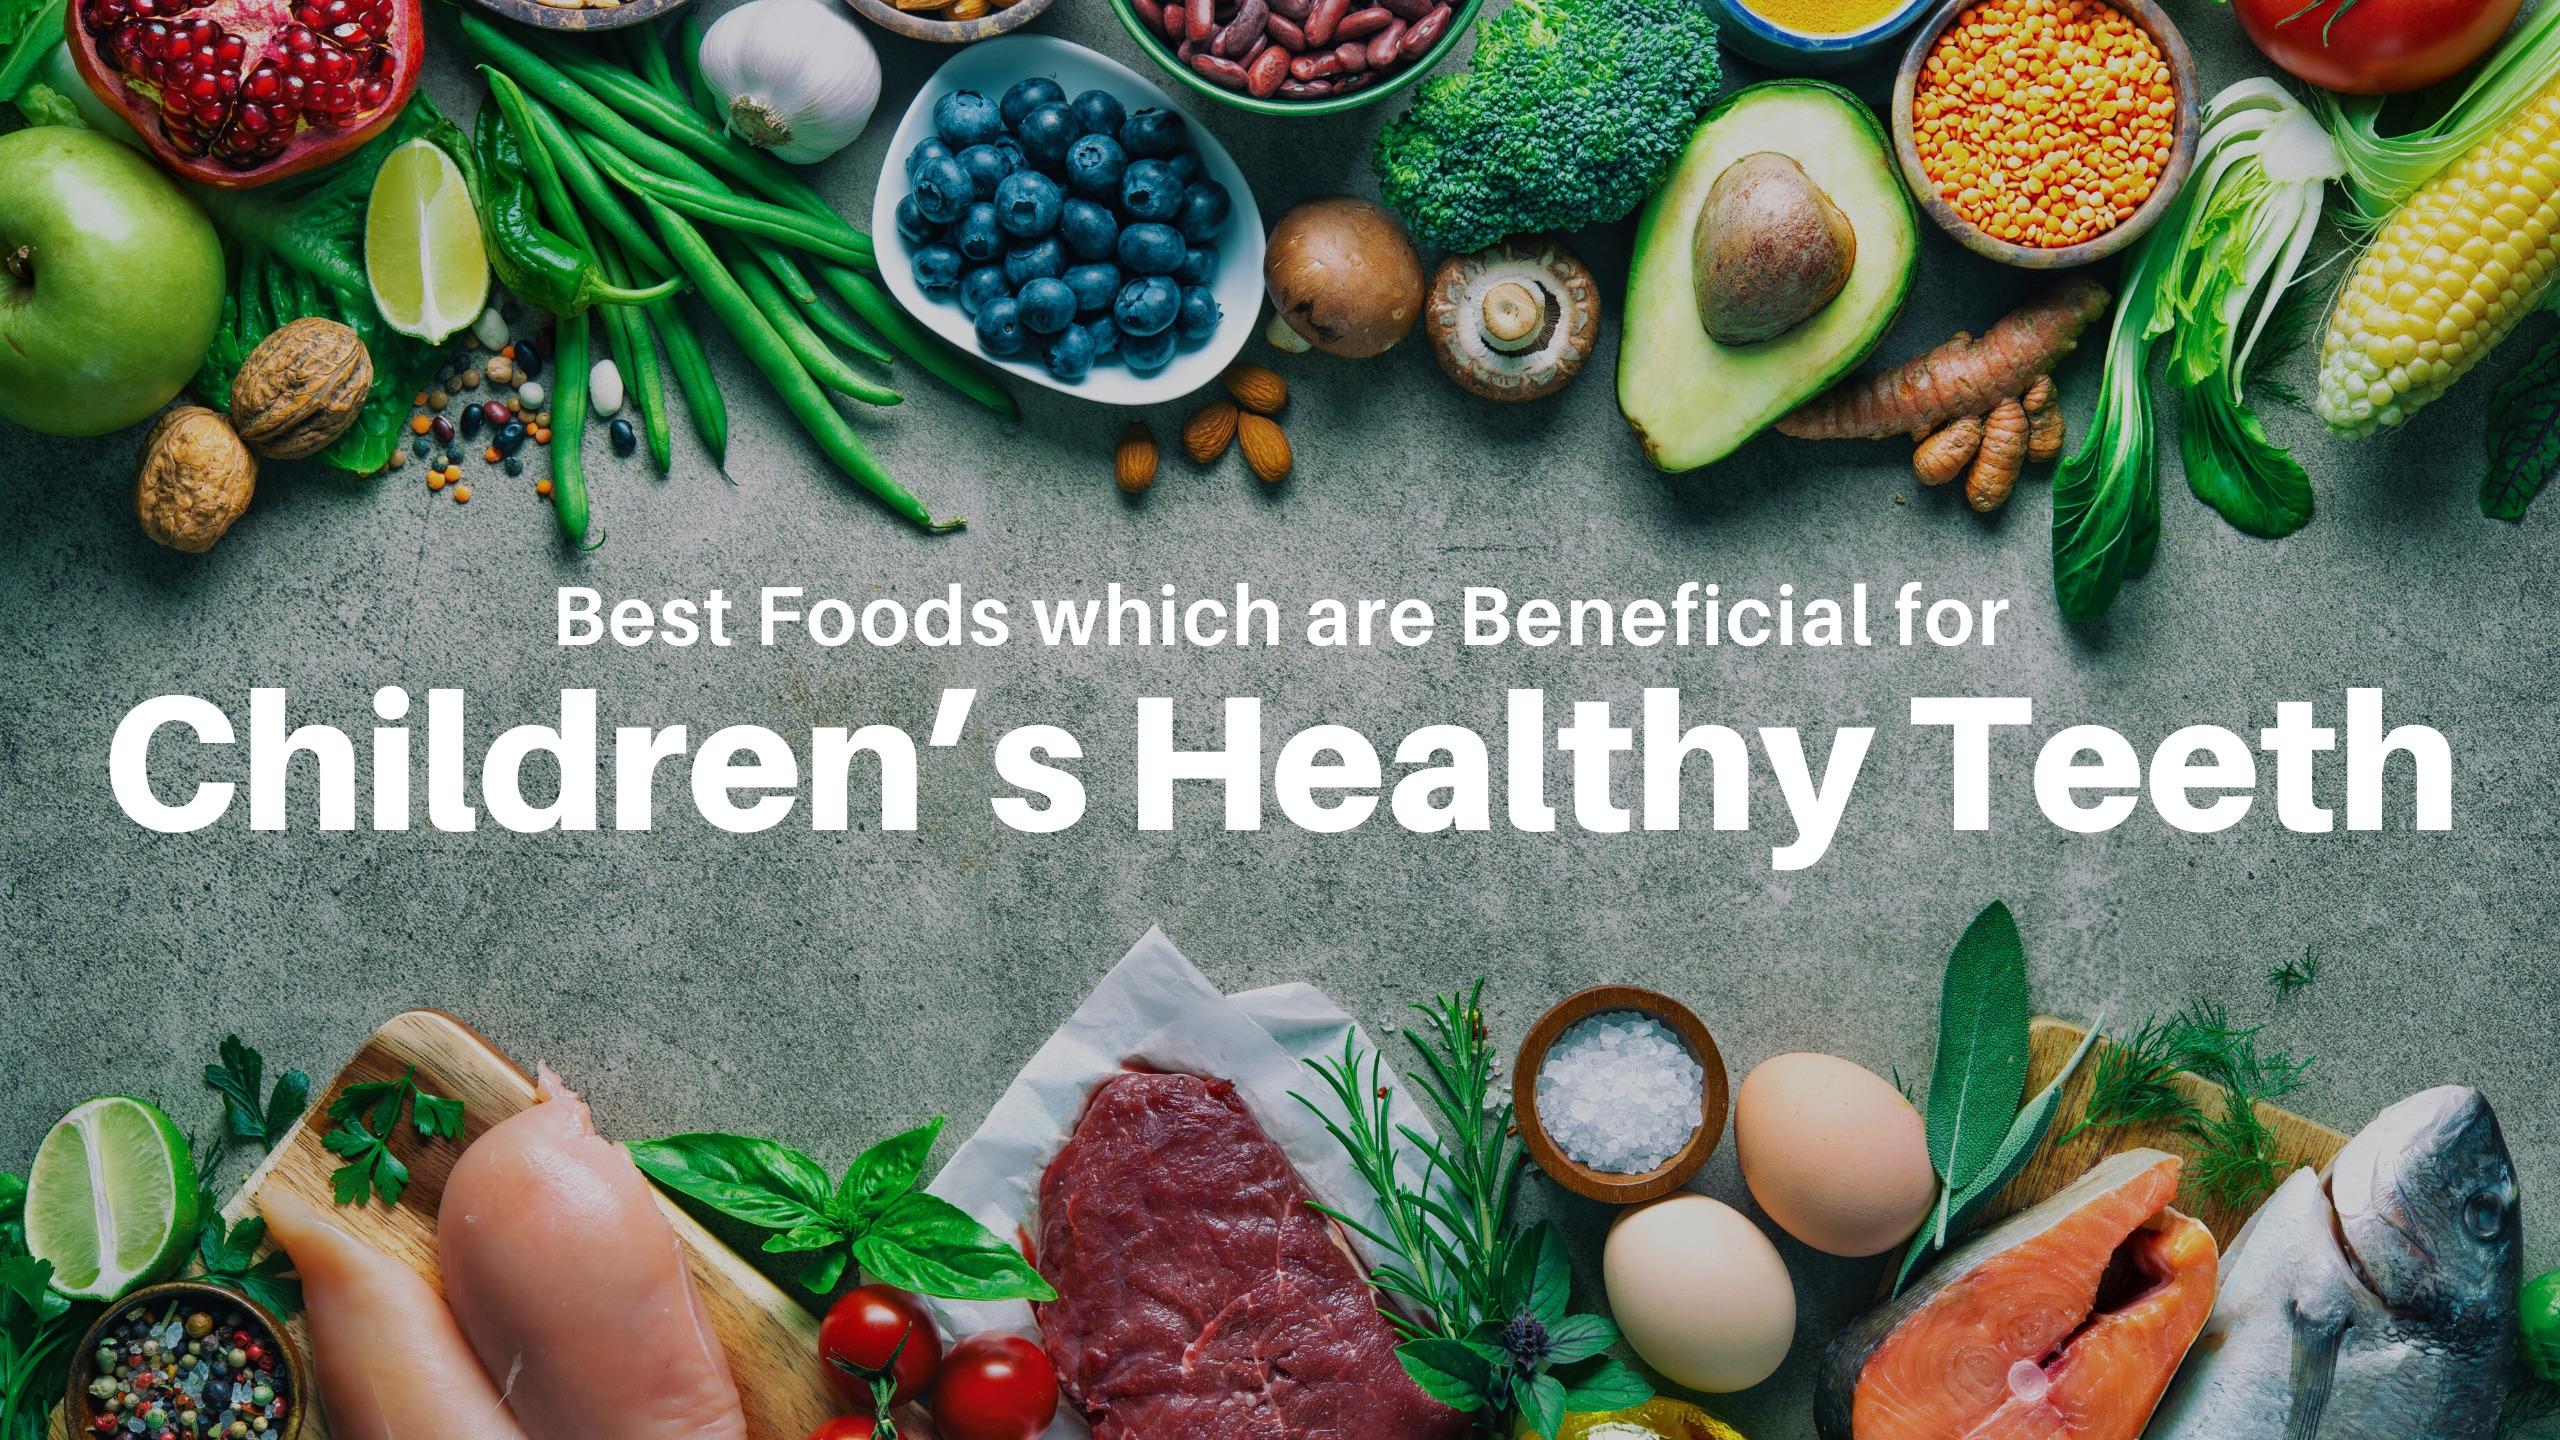 Children's Food for Healthy Teeth